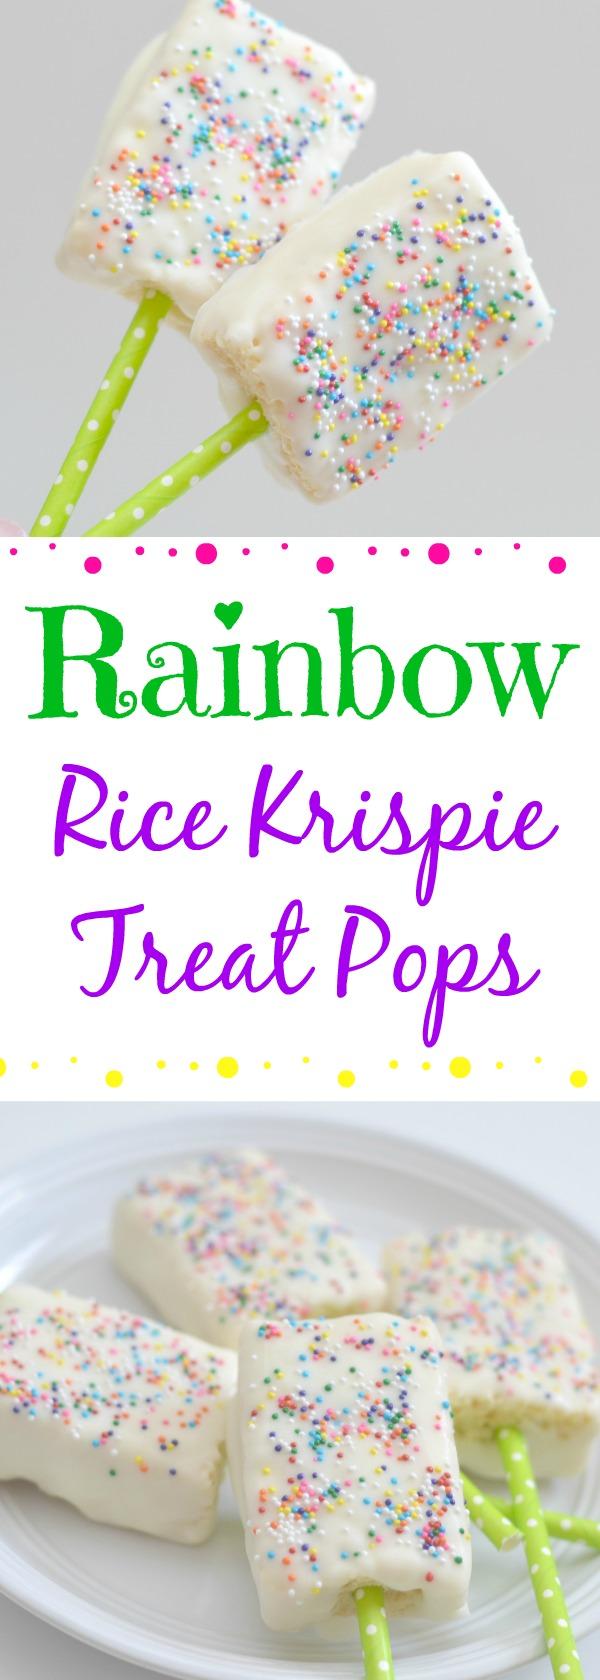 Rainbow Rice Krispie Treat Pops recipe, easy rainbow desserts, easy desserts, chocolate covered rice krispie treats, rice krispie treat pops, rainbow rice krispies, st. patricks day desserts, st. patricks day treats, easy st. patricks day recipes